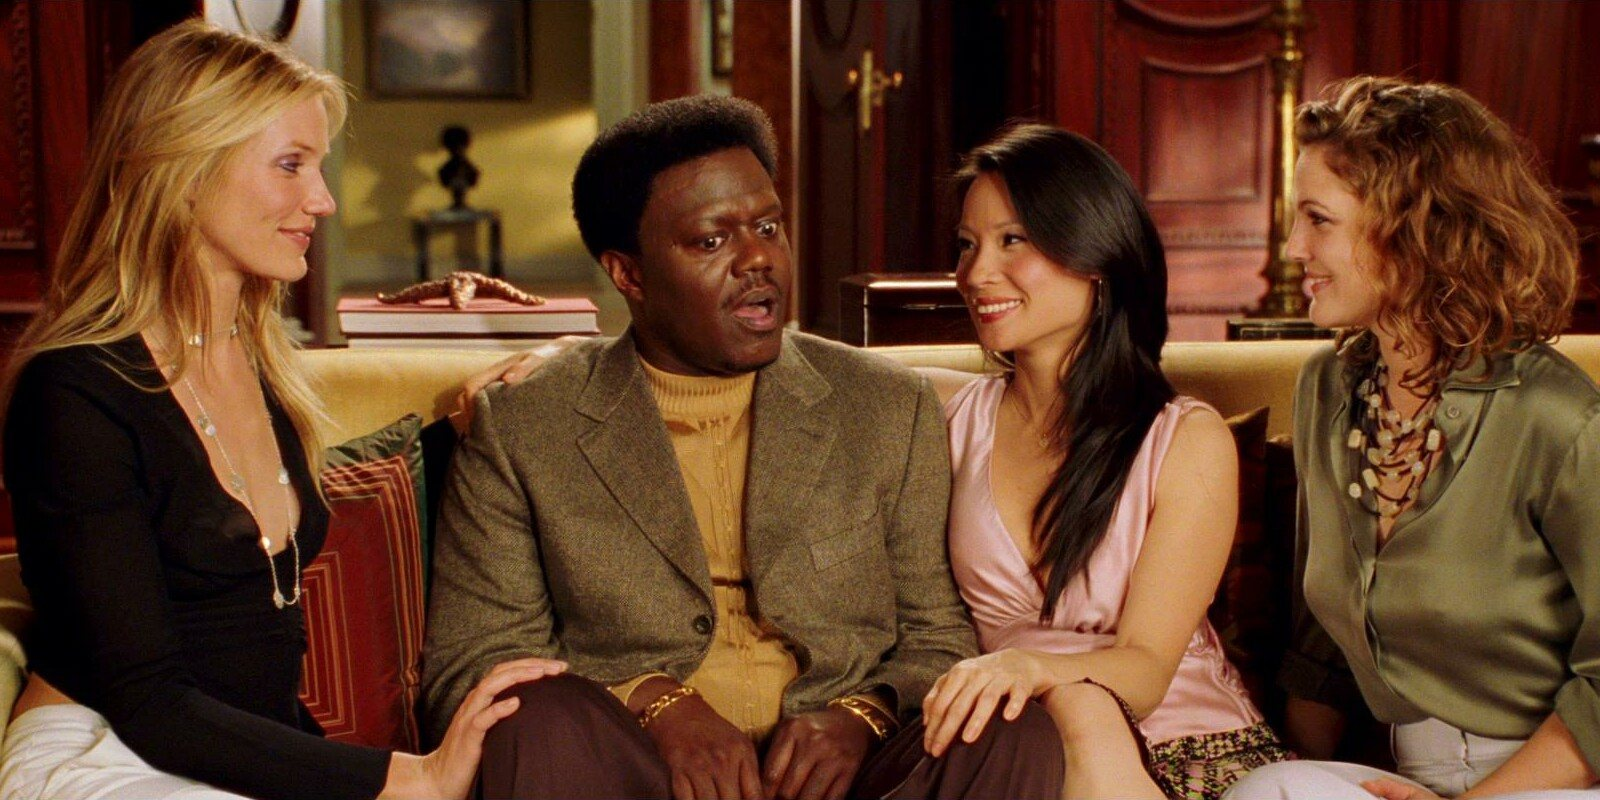 Cameron Diaz, Bernie Mac, Lucy Liu, and Drew Barrymore in Charlie's Angels: Full Throttle